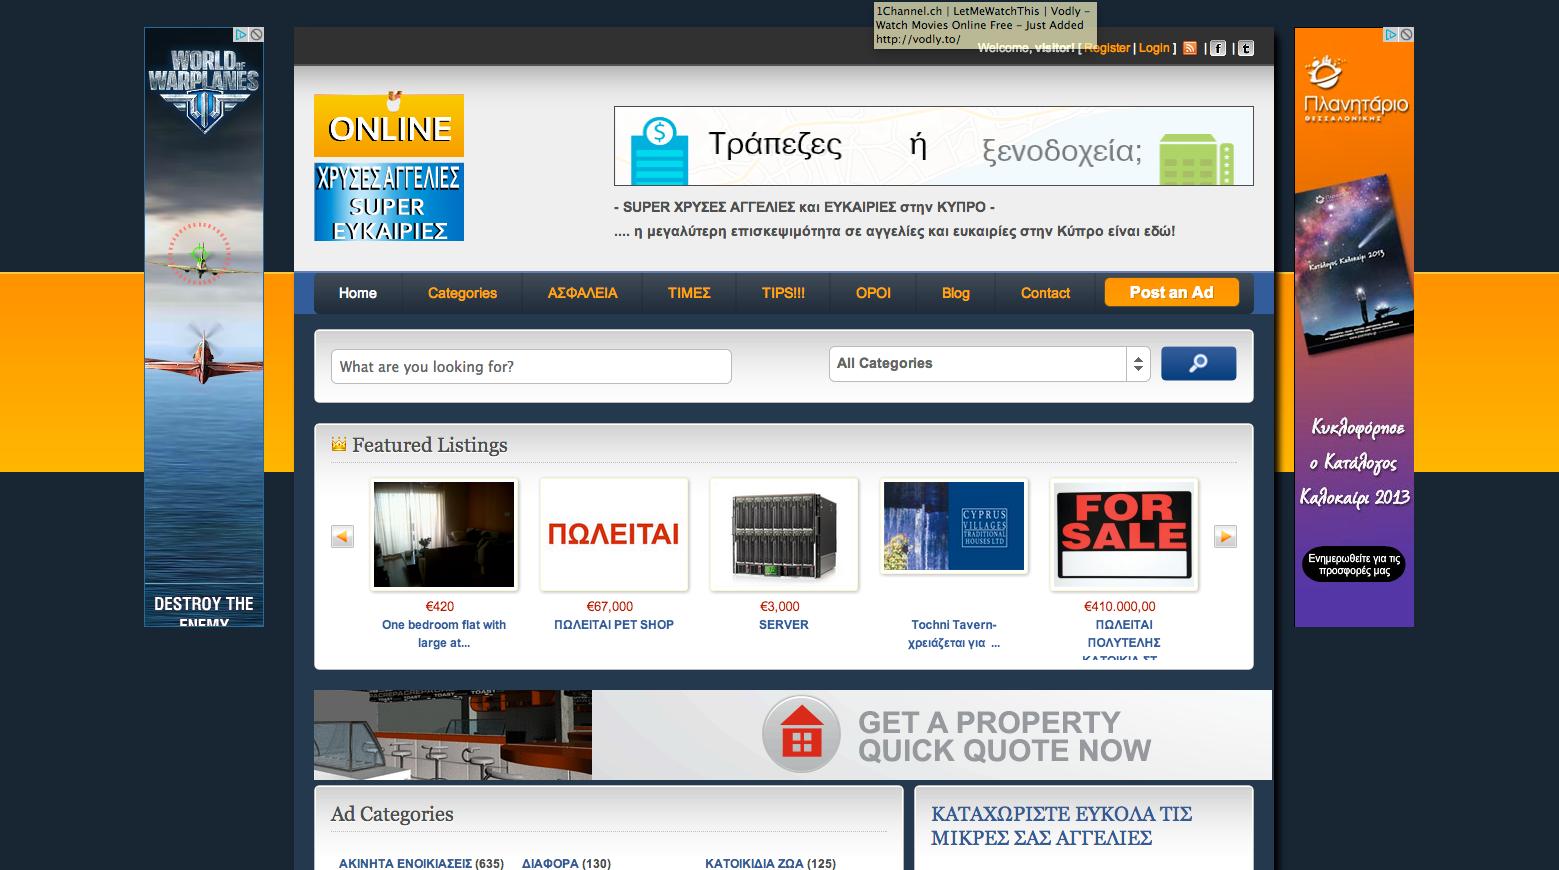 http://www.onlycy.com/xrises-efkairies-cyprus/